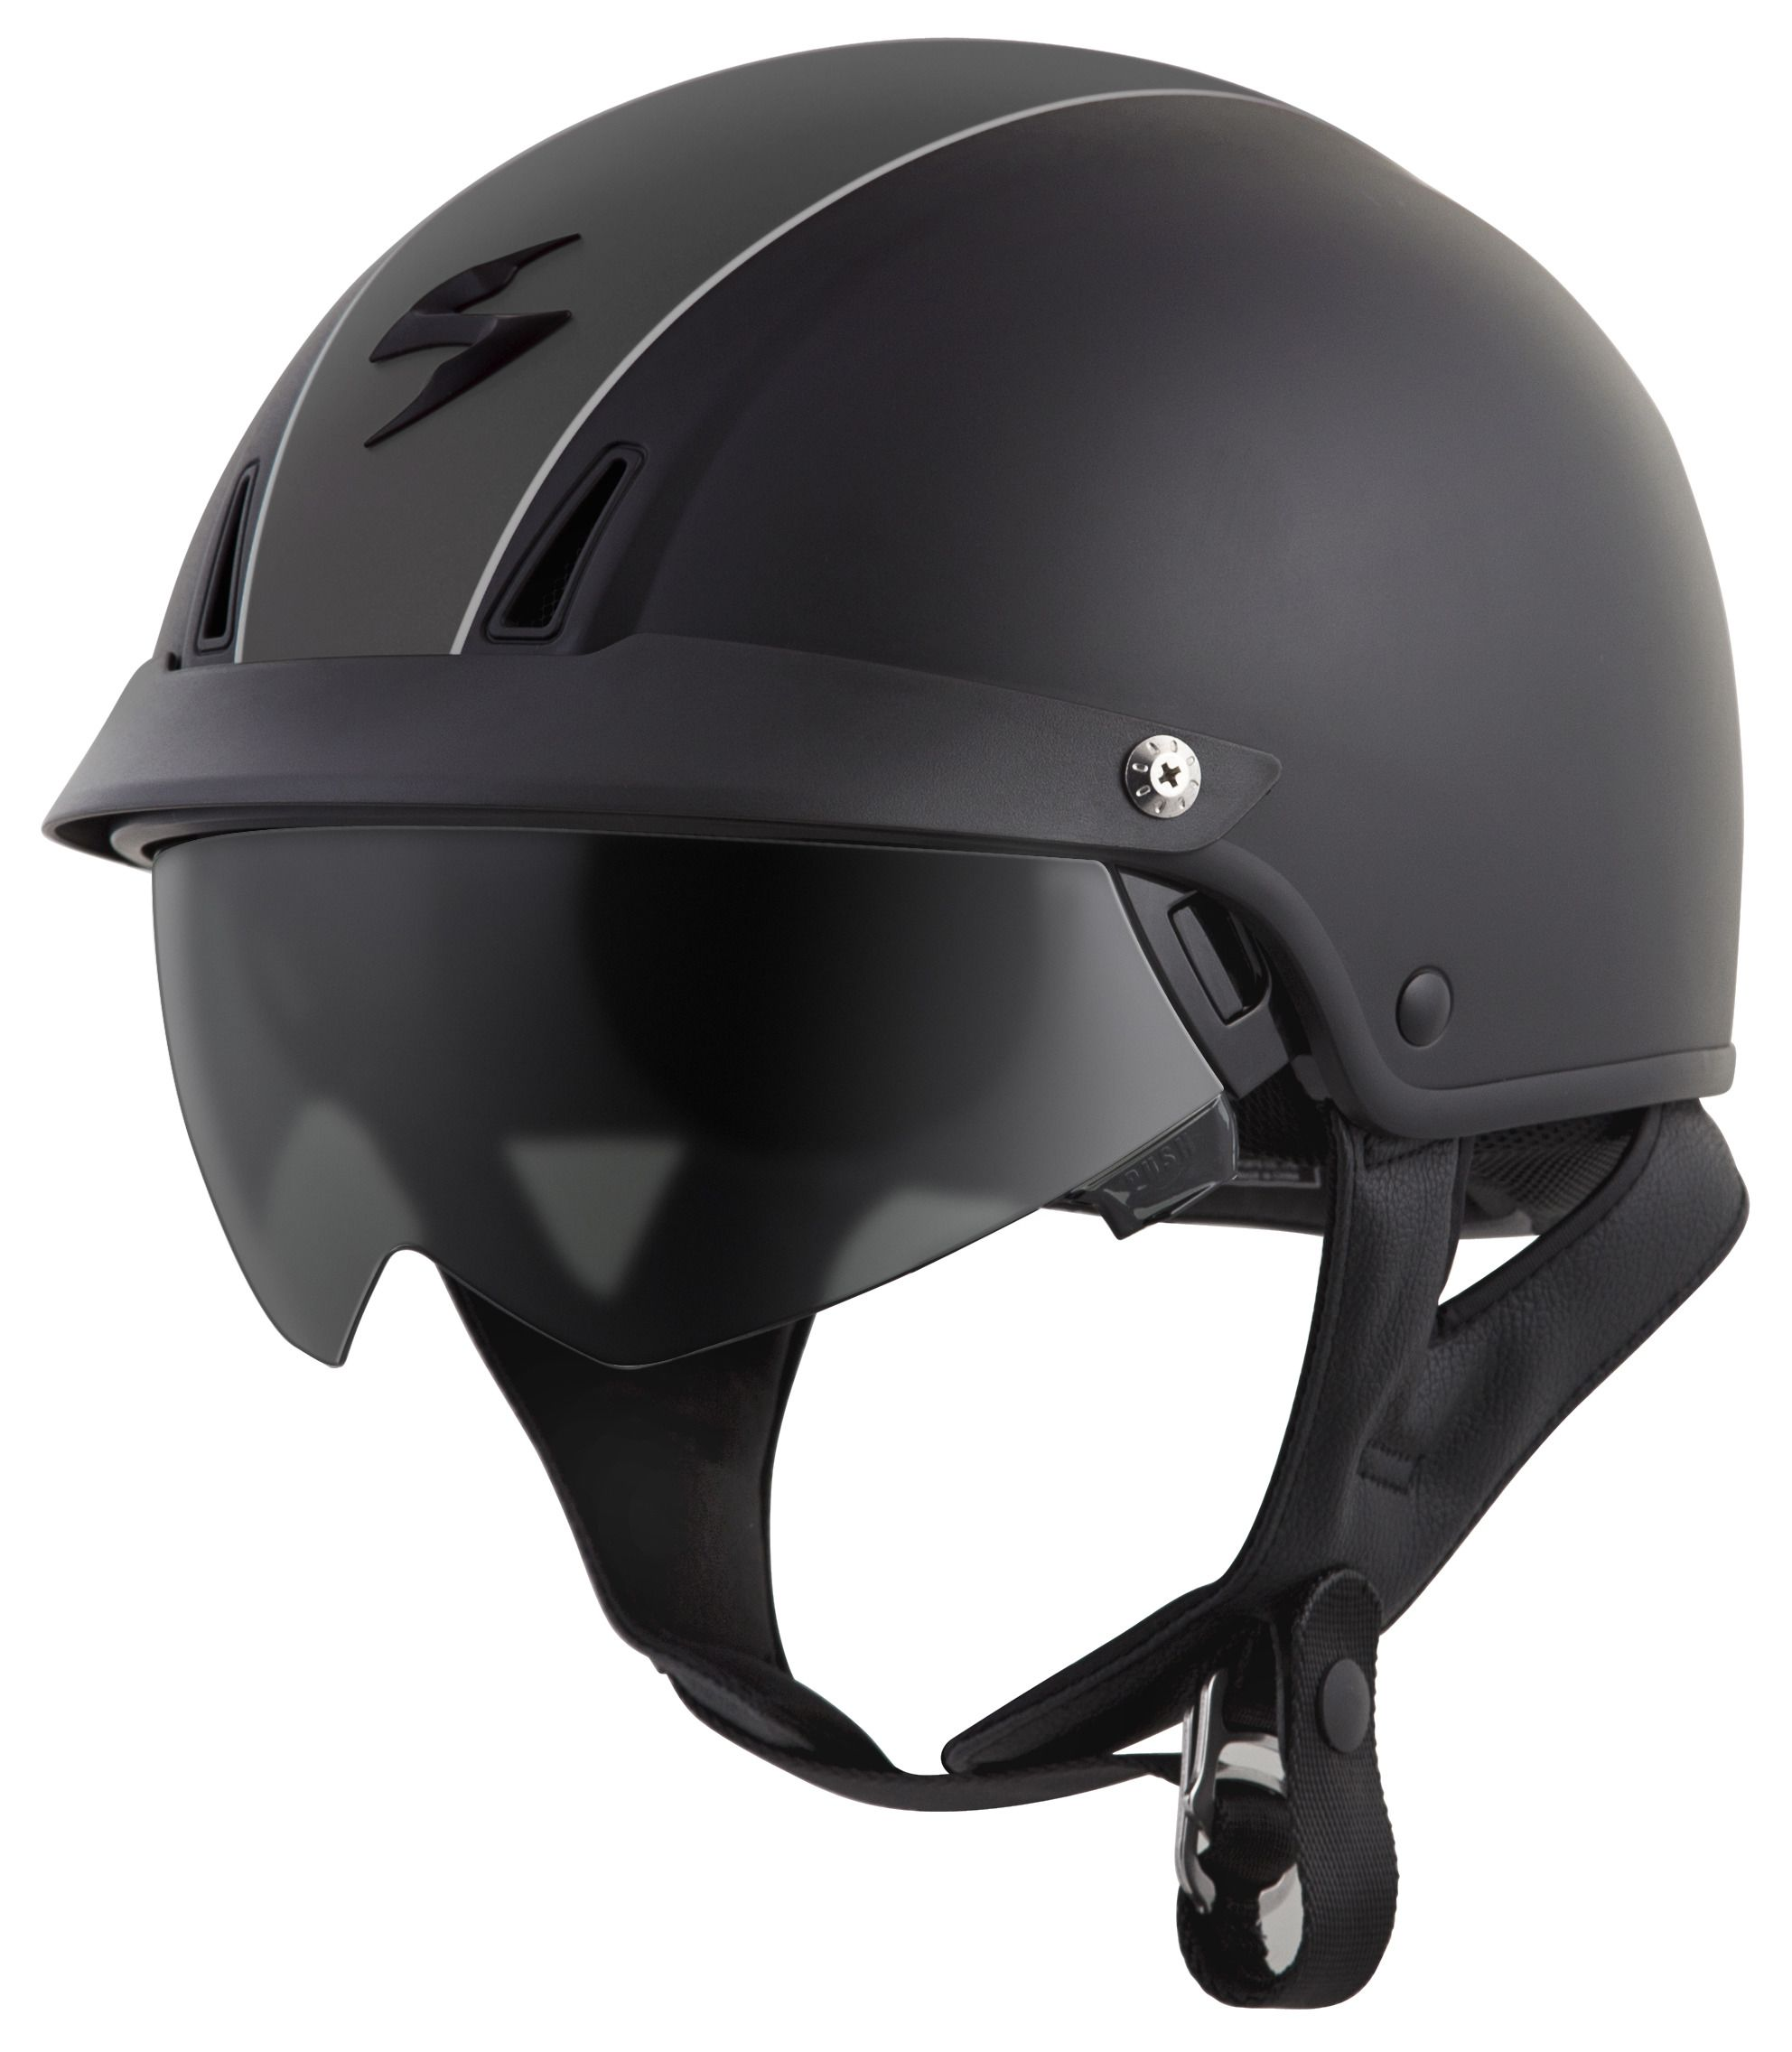 scorpion exo c110 split helmet revzilla. Black Bedroom Furniture Sets. Home Design Ideas